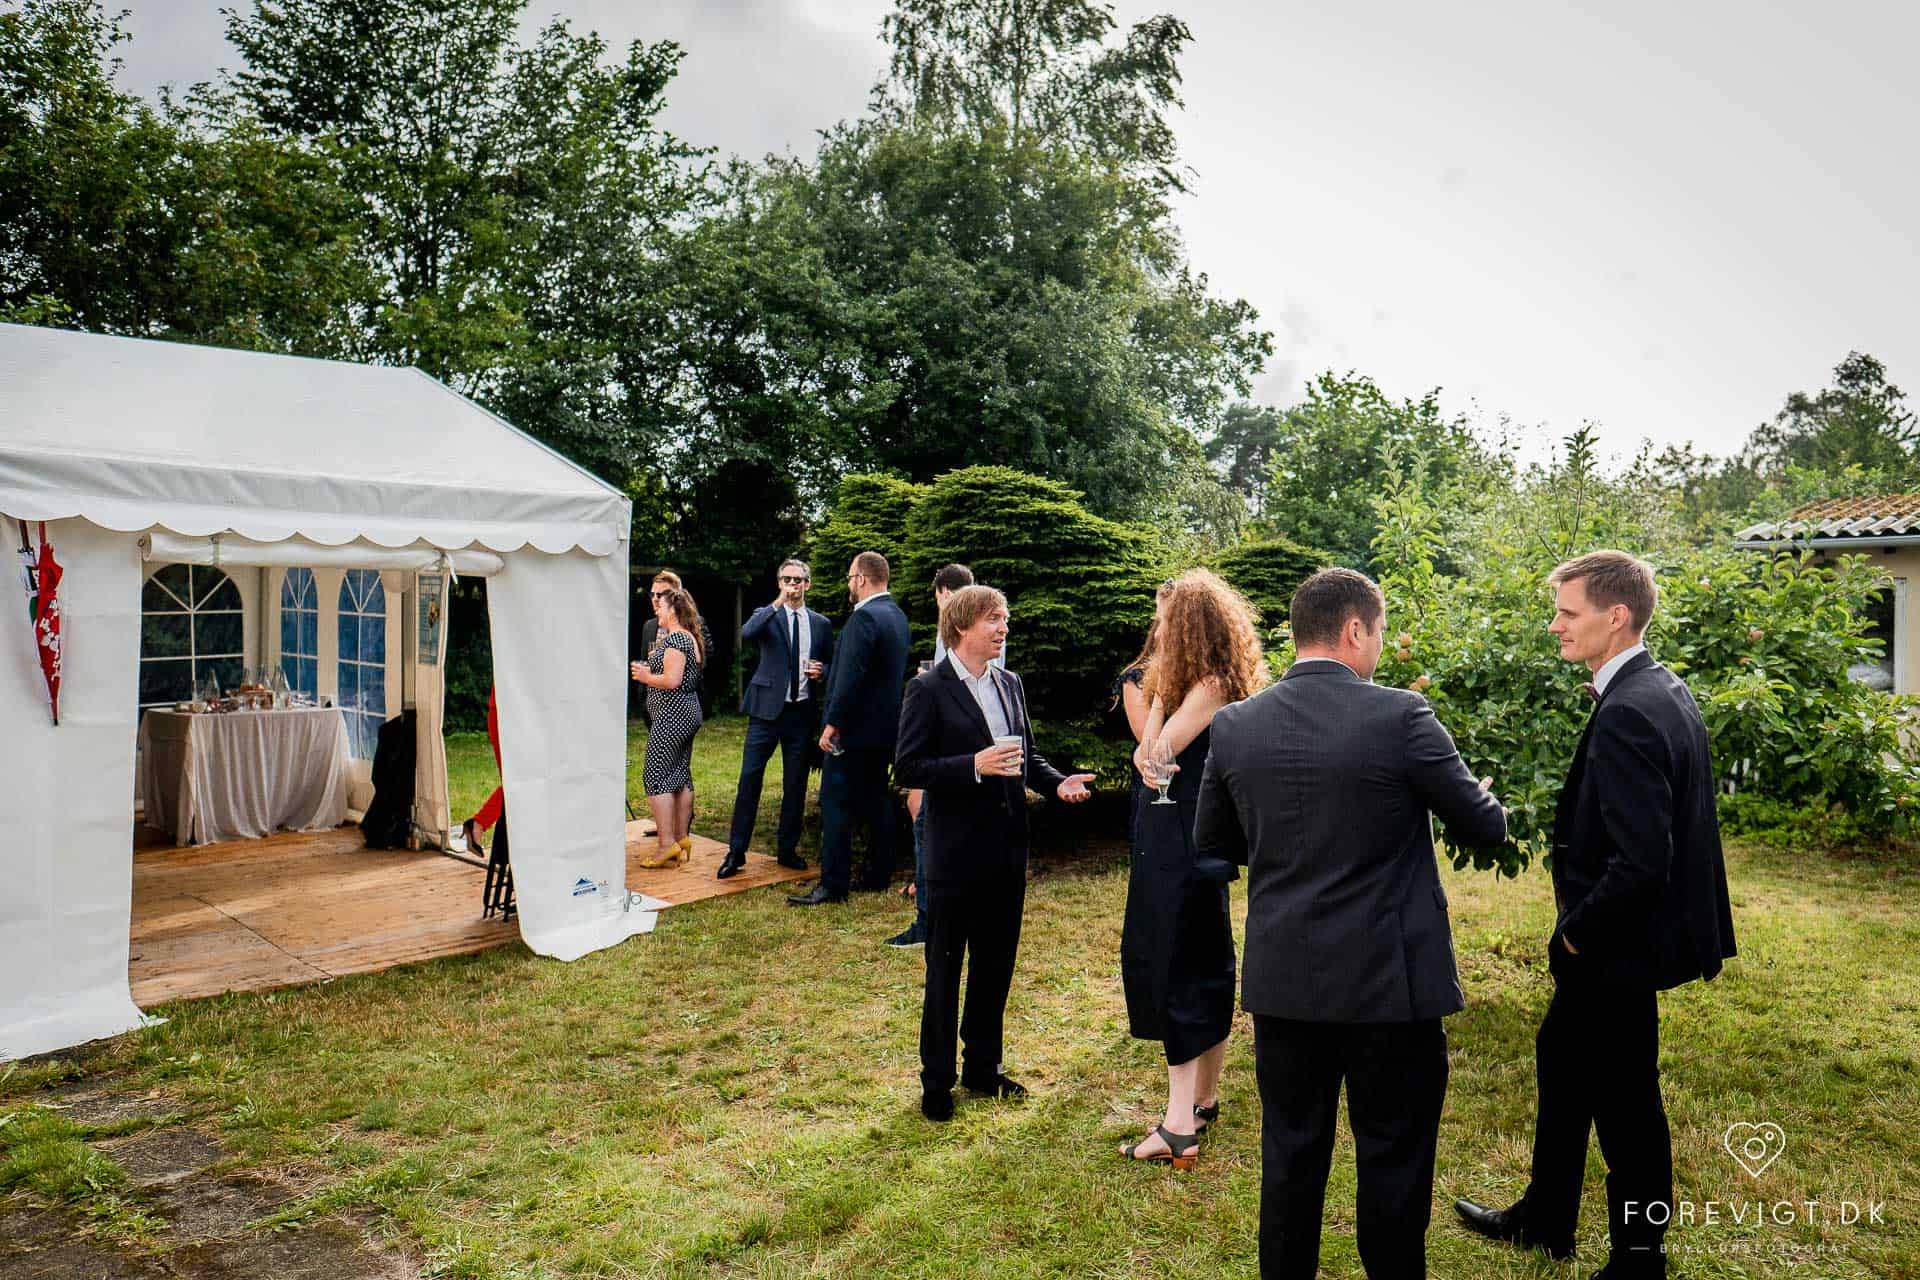 Bryllupstelte i Århus, Herning, Horsens, Randers, Silkeborg